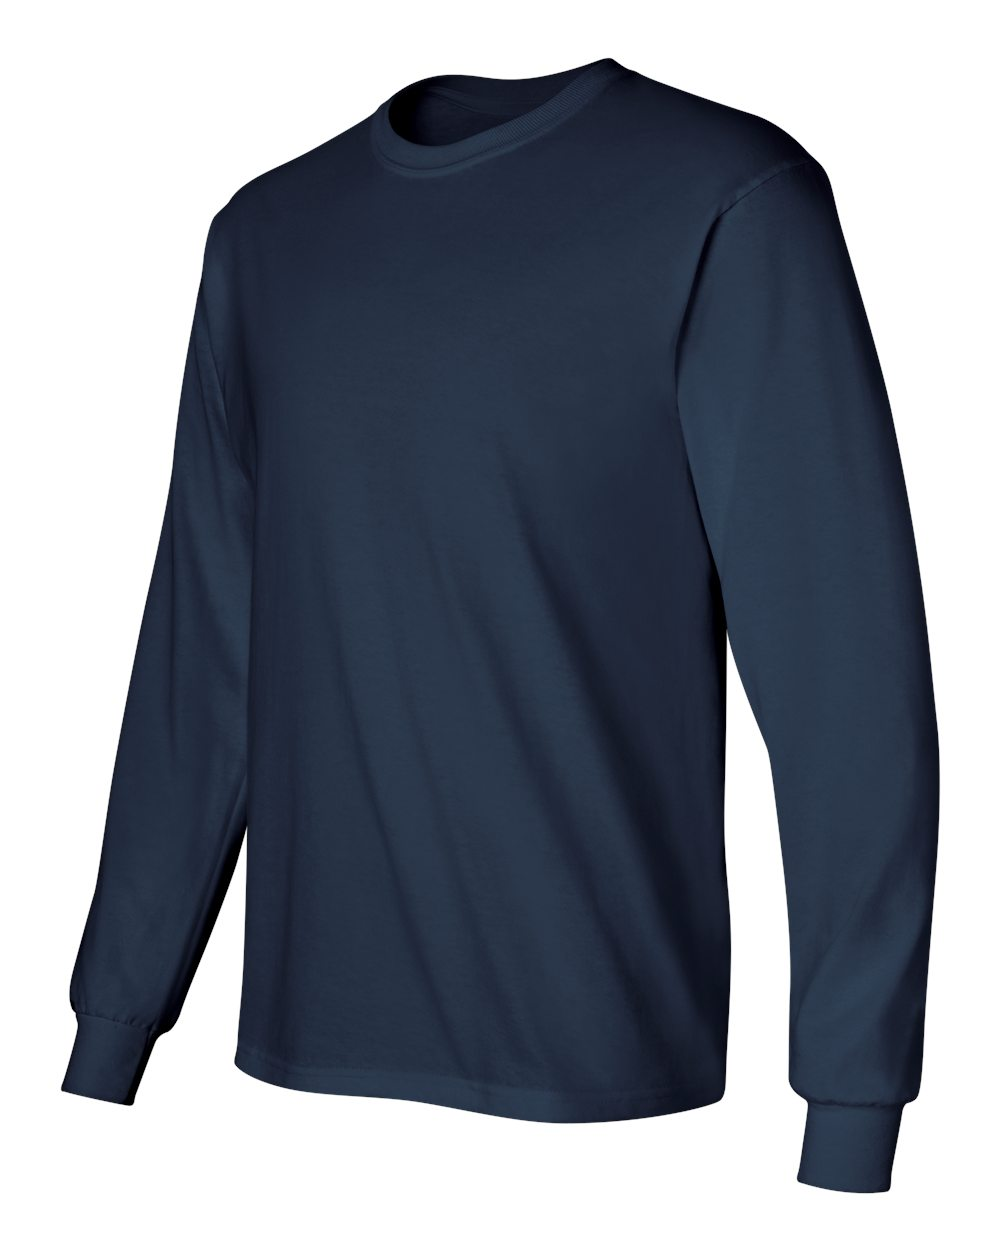 Gildan-Men-039-s-Ultra-Cotton-6-oz-Long-Sleeve-T-Shirt-G240-S-5XL thumbnail 67